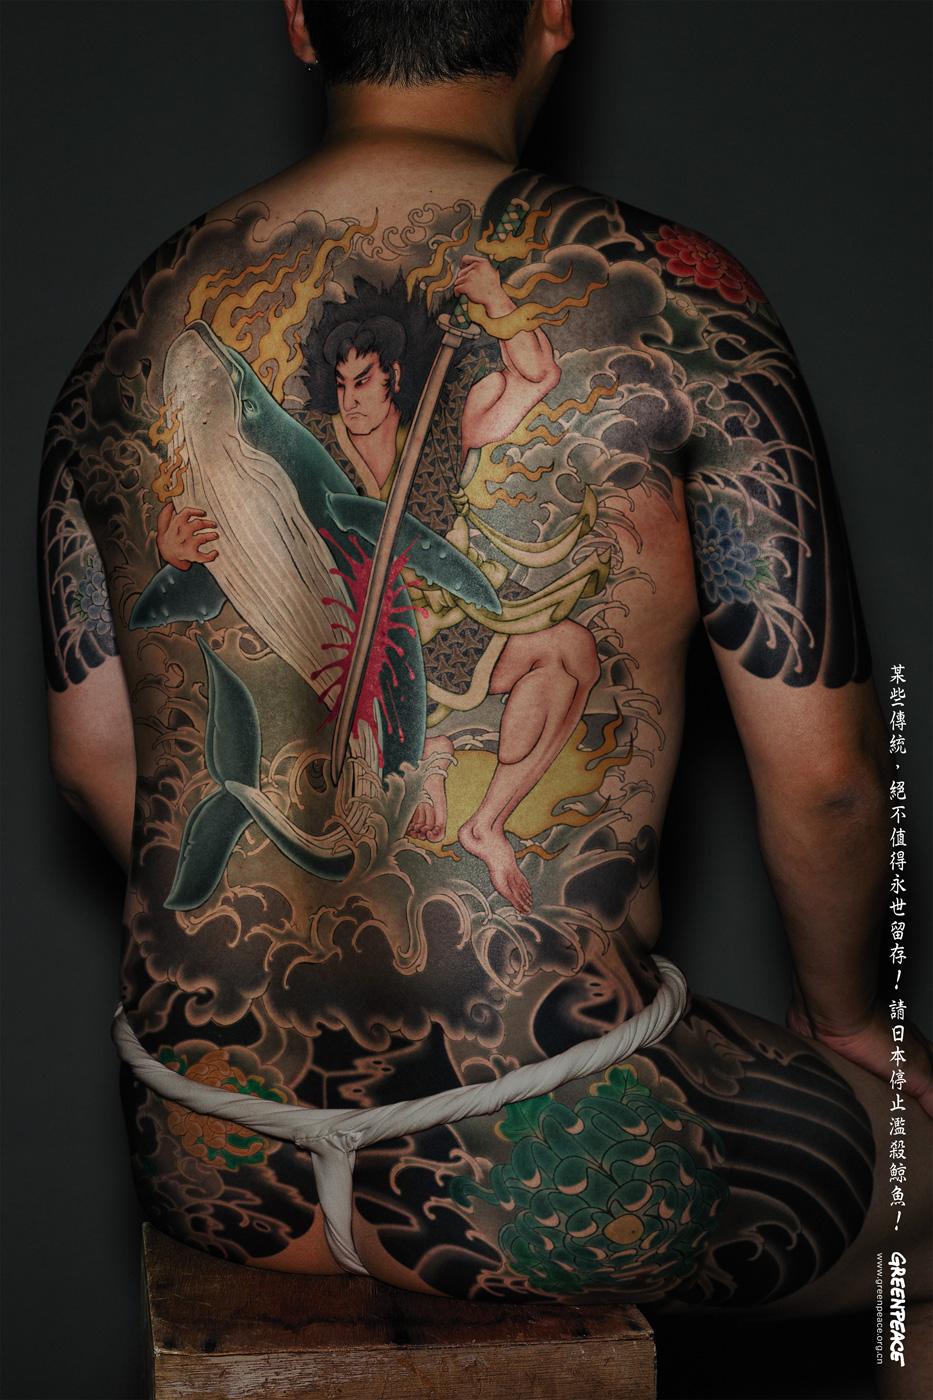 Asian Tattoos Illustrations: Samurai Tattoos-Code Of Bushido-Japanese Tattoo Designs